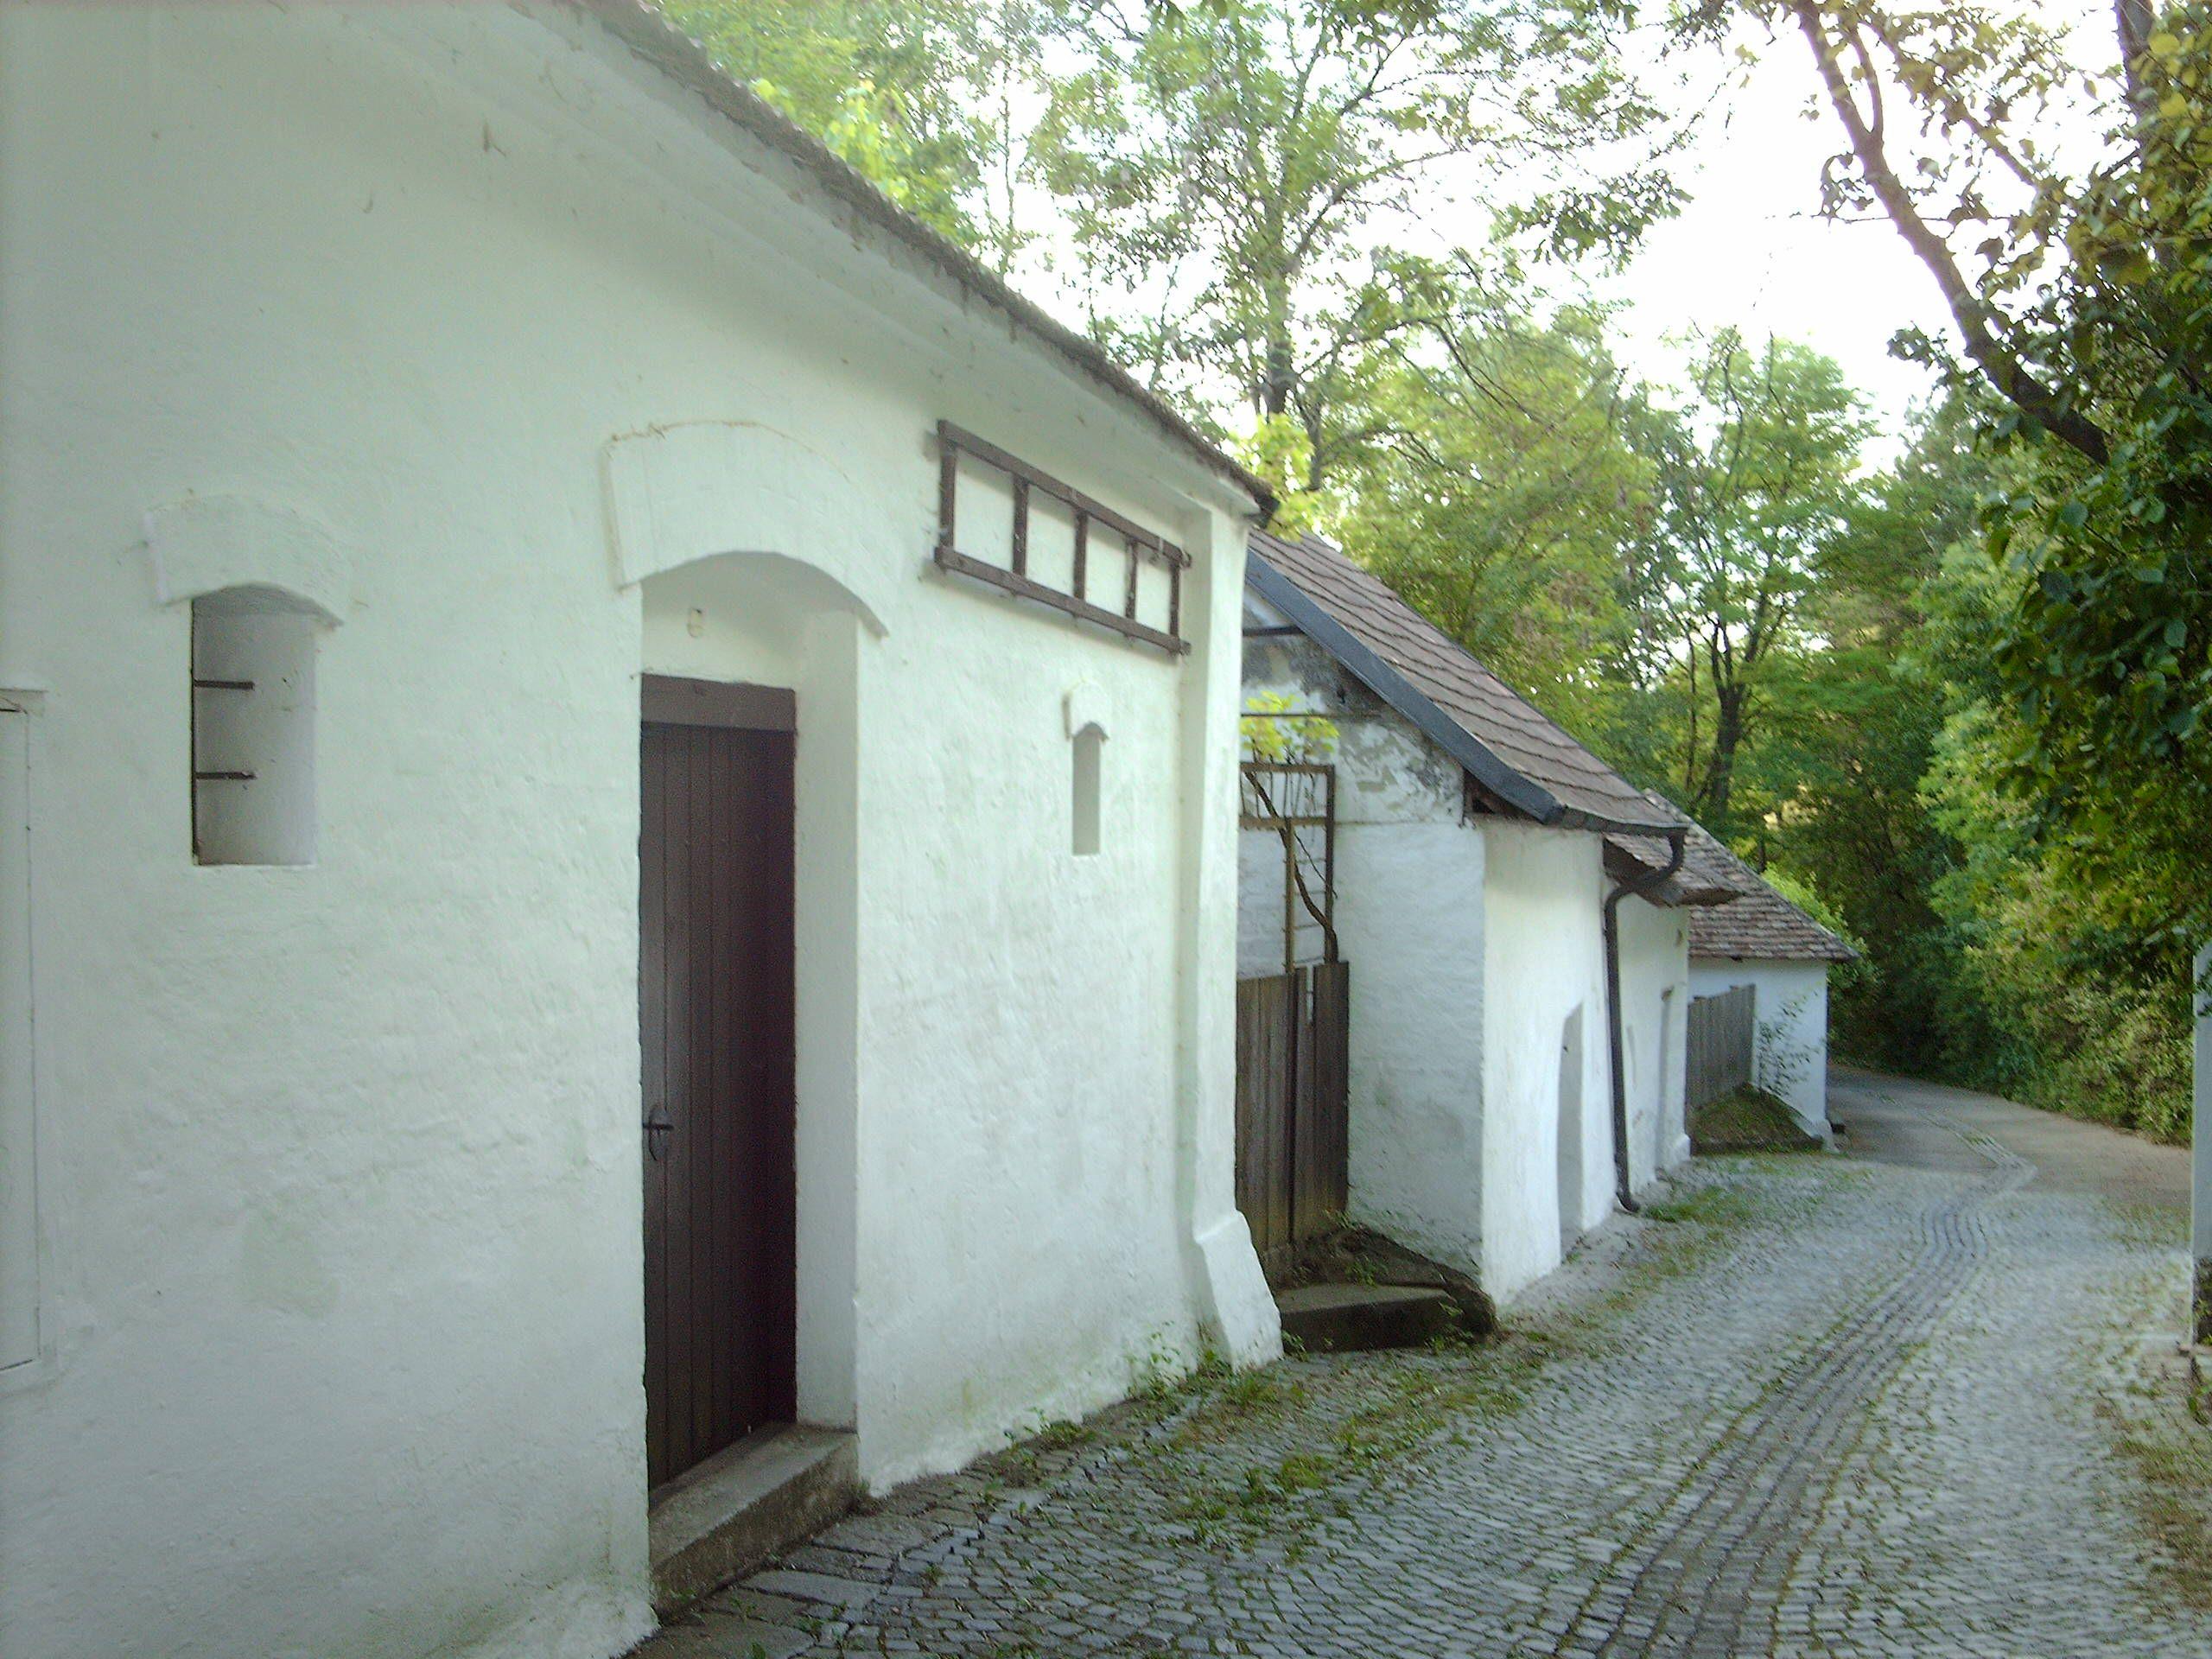 Typical wine cellar alley in the wine region of lower austria